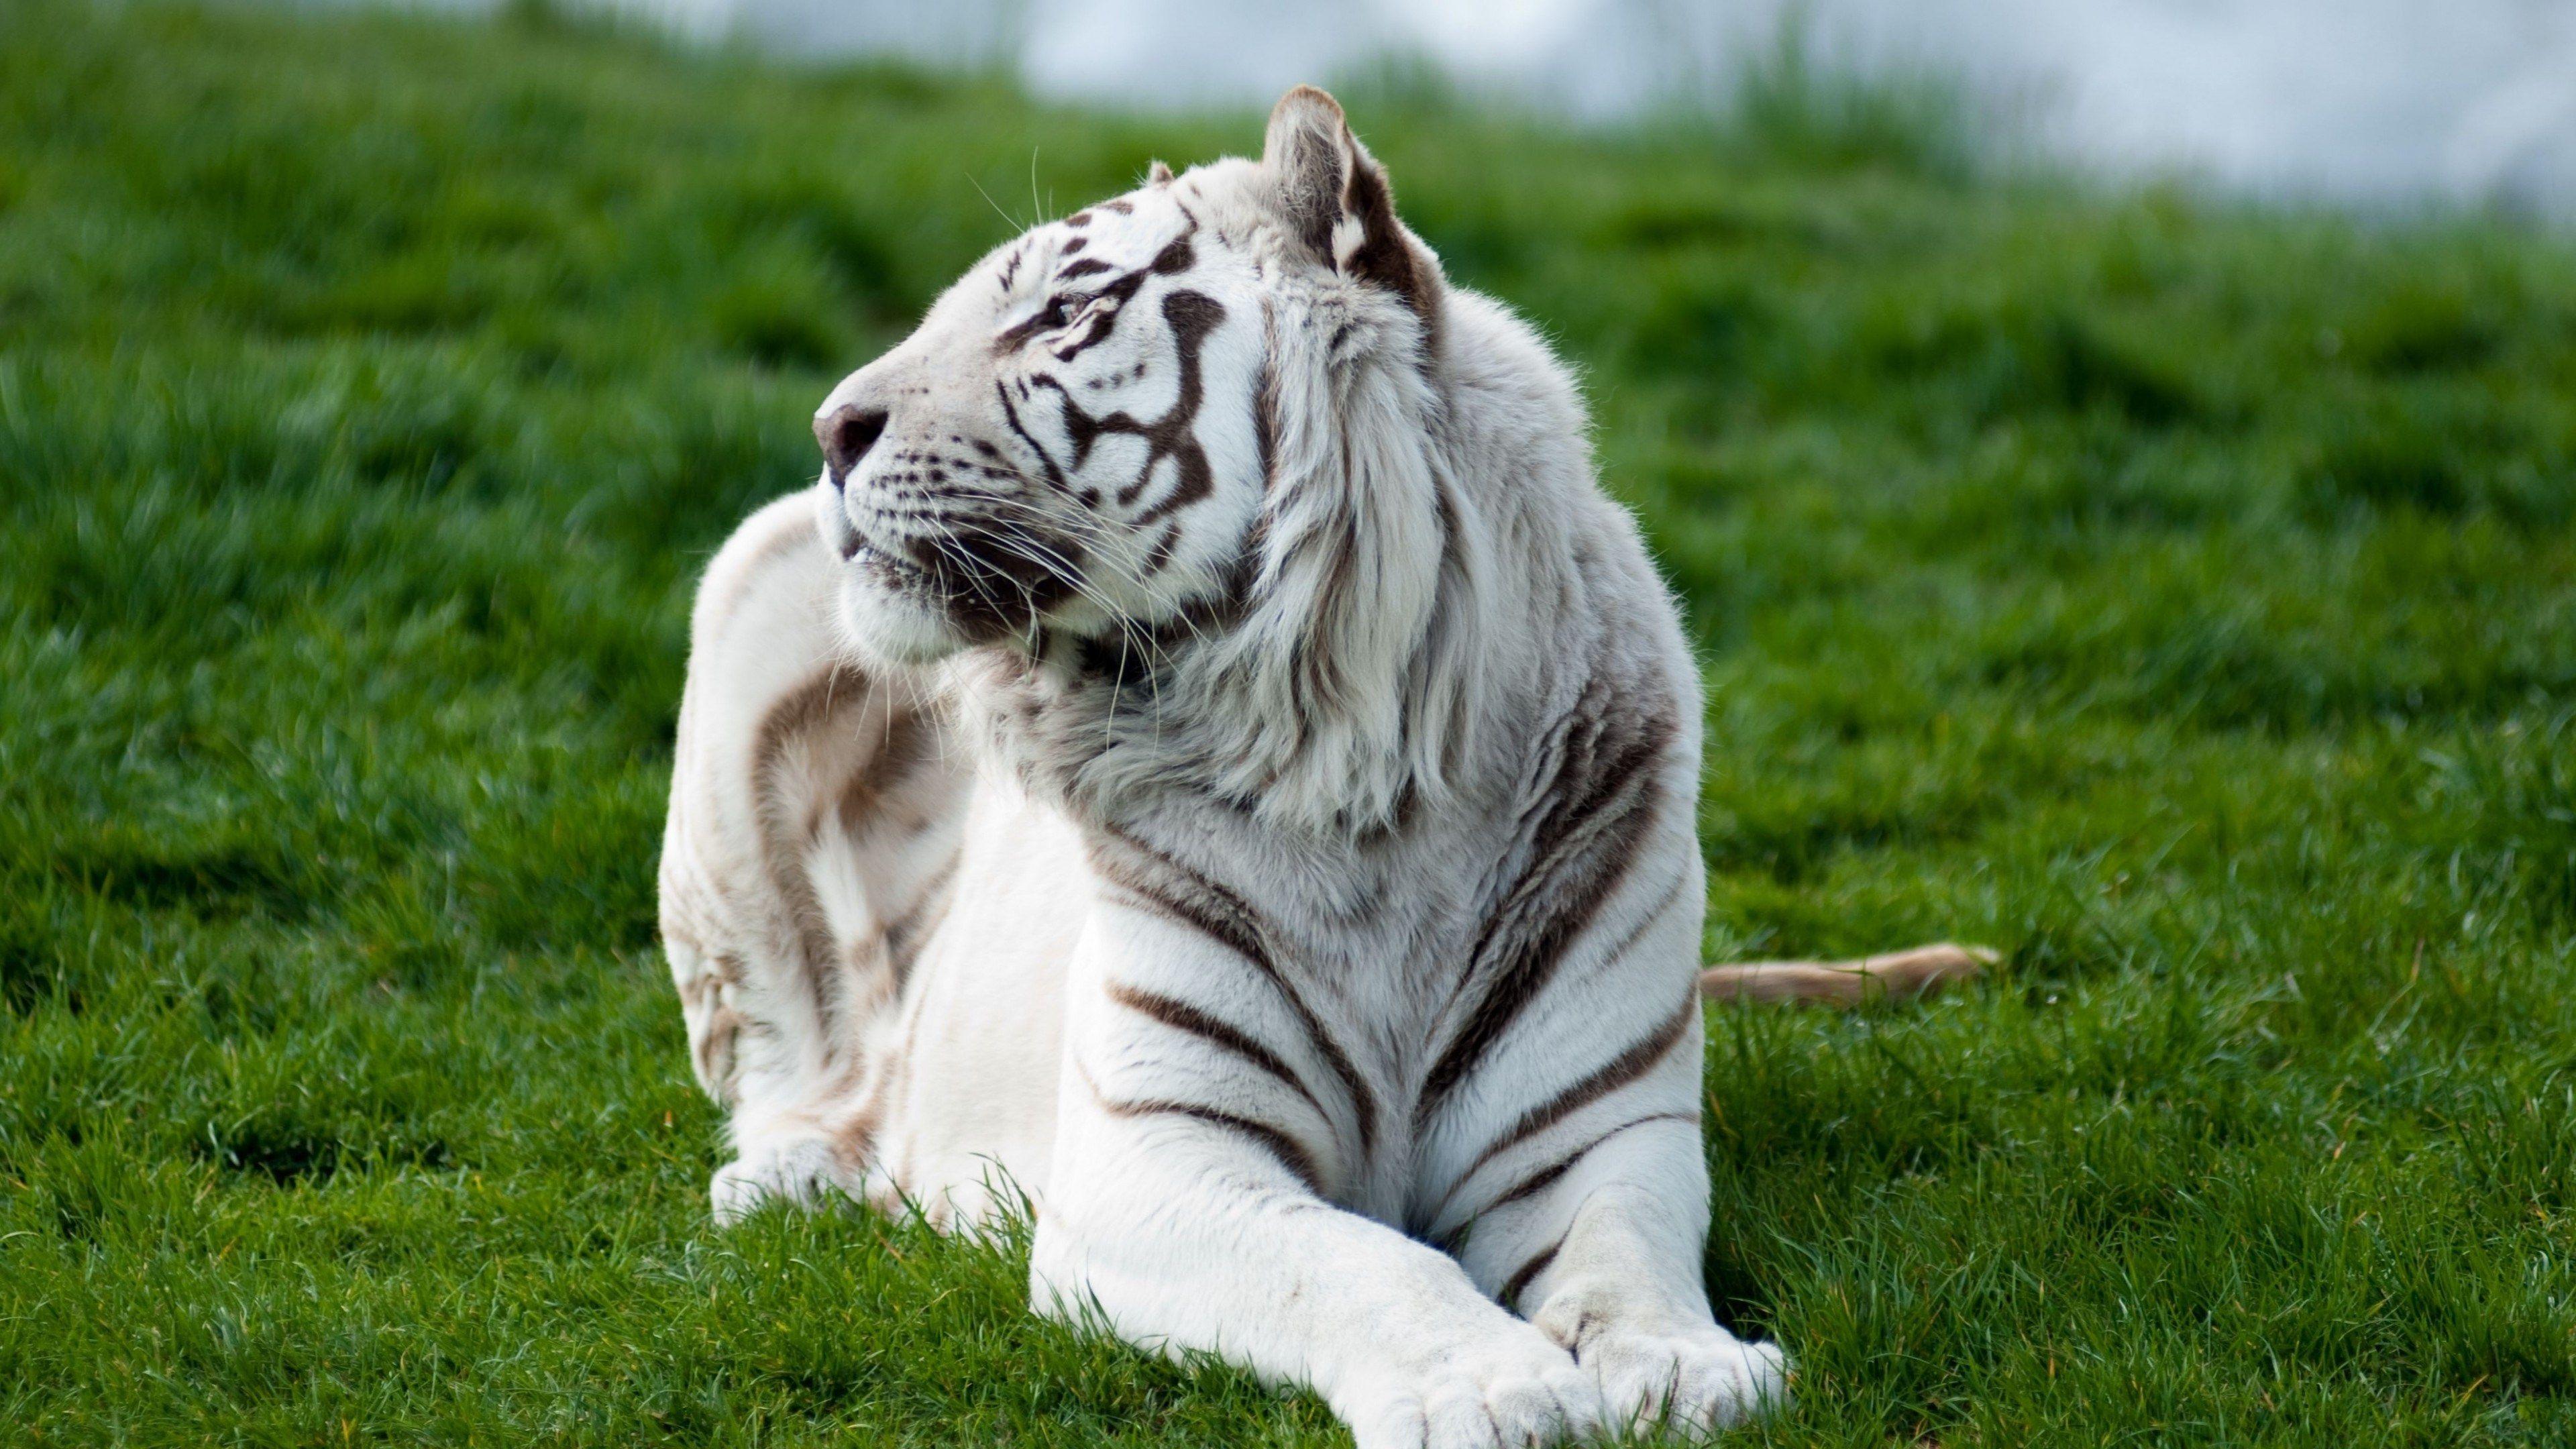 3840x2160 Tiger 4k Wallpaper Pc Full Hd Bolshie Koshki Belye Tigry Zhivotnye